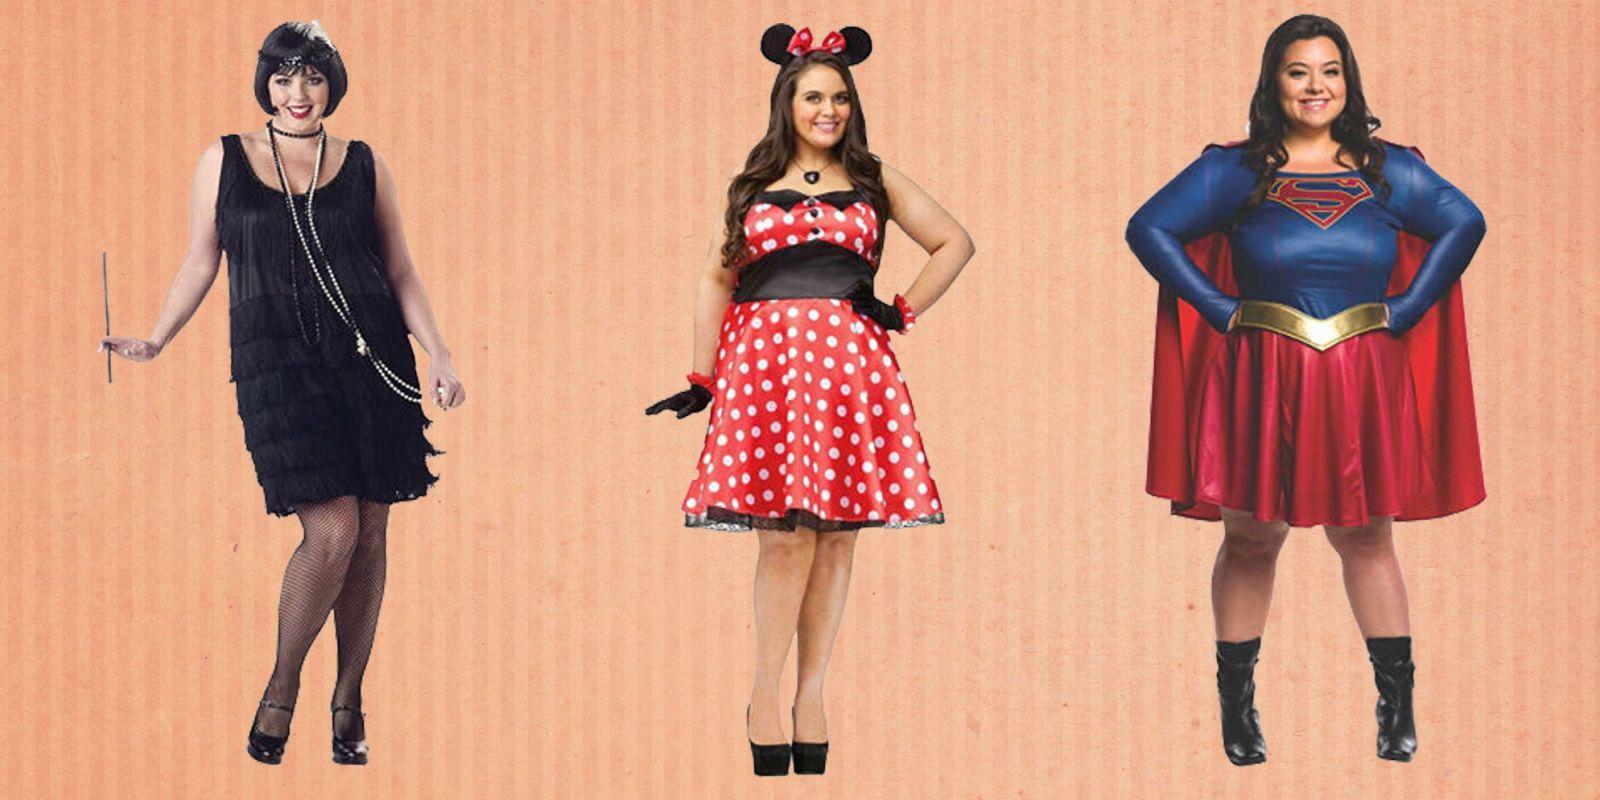 halloween costume ideas for plus size women - otto.codeemperor